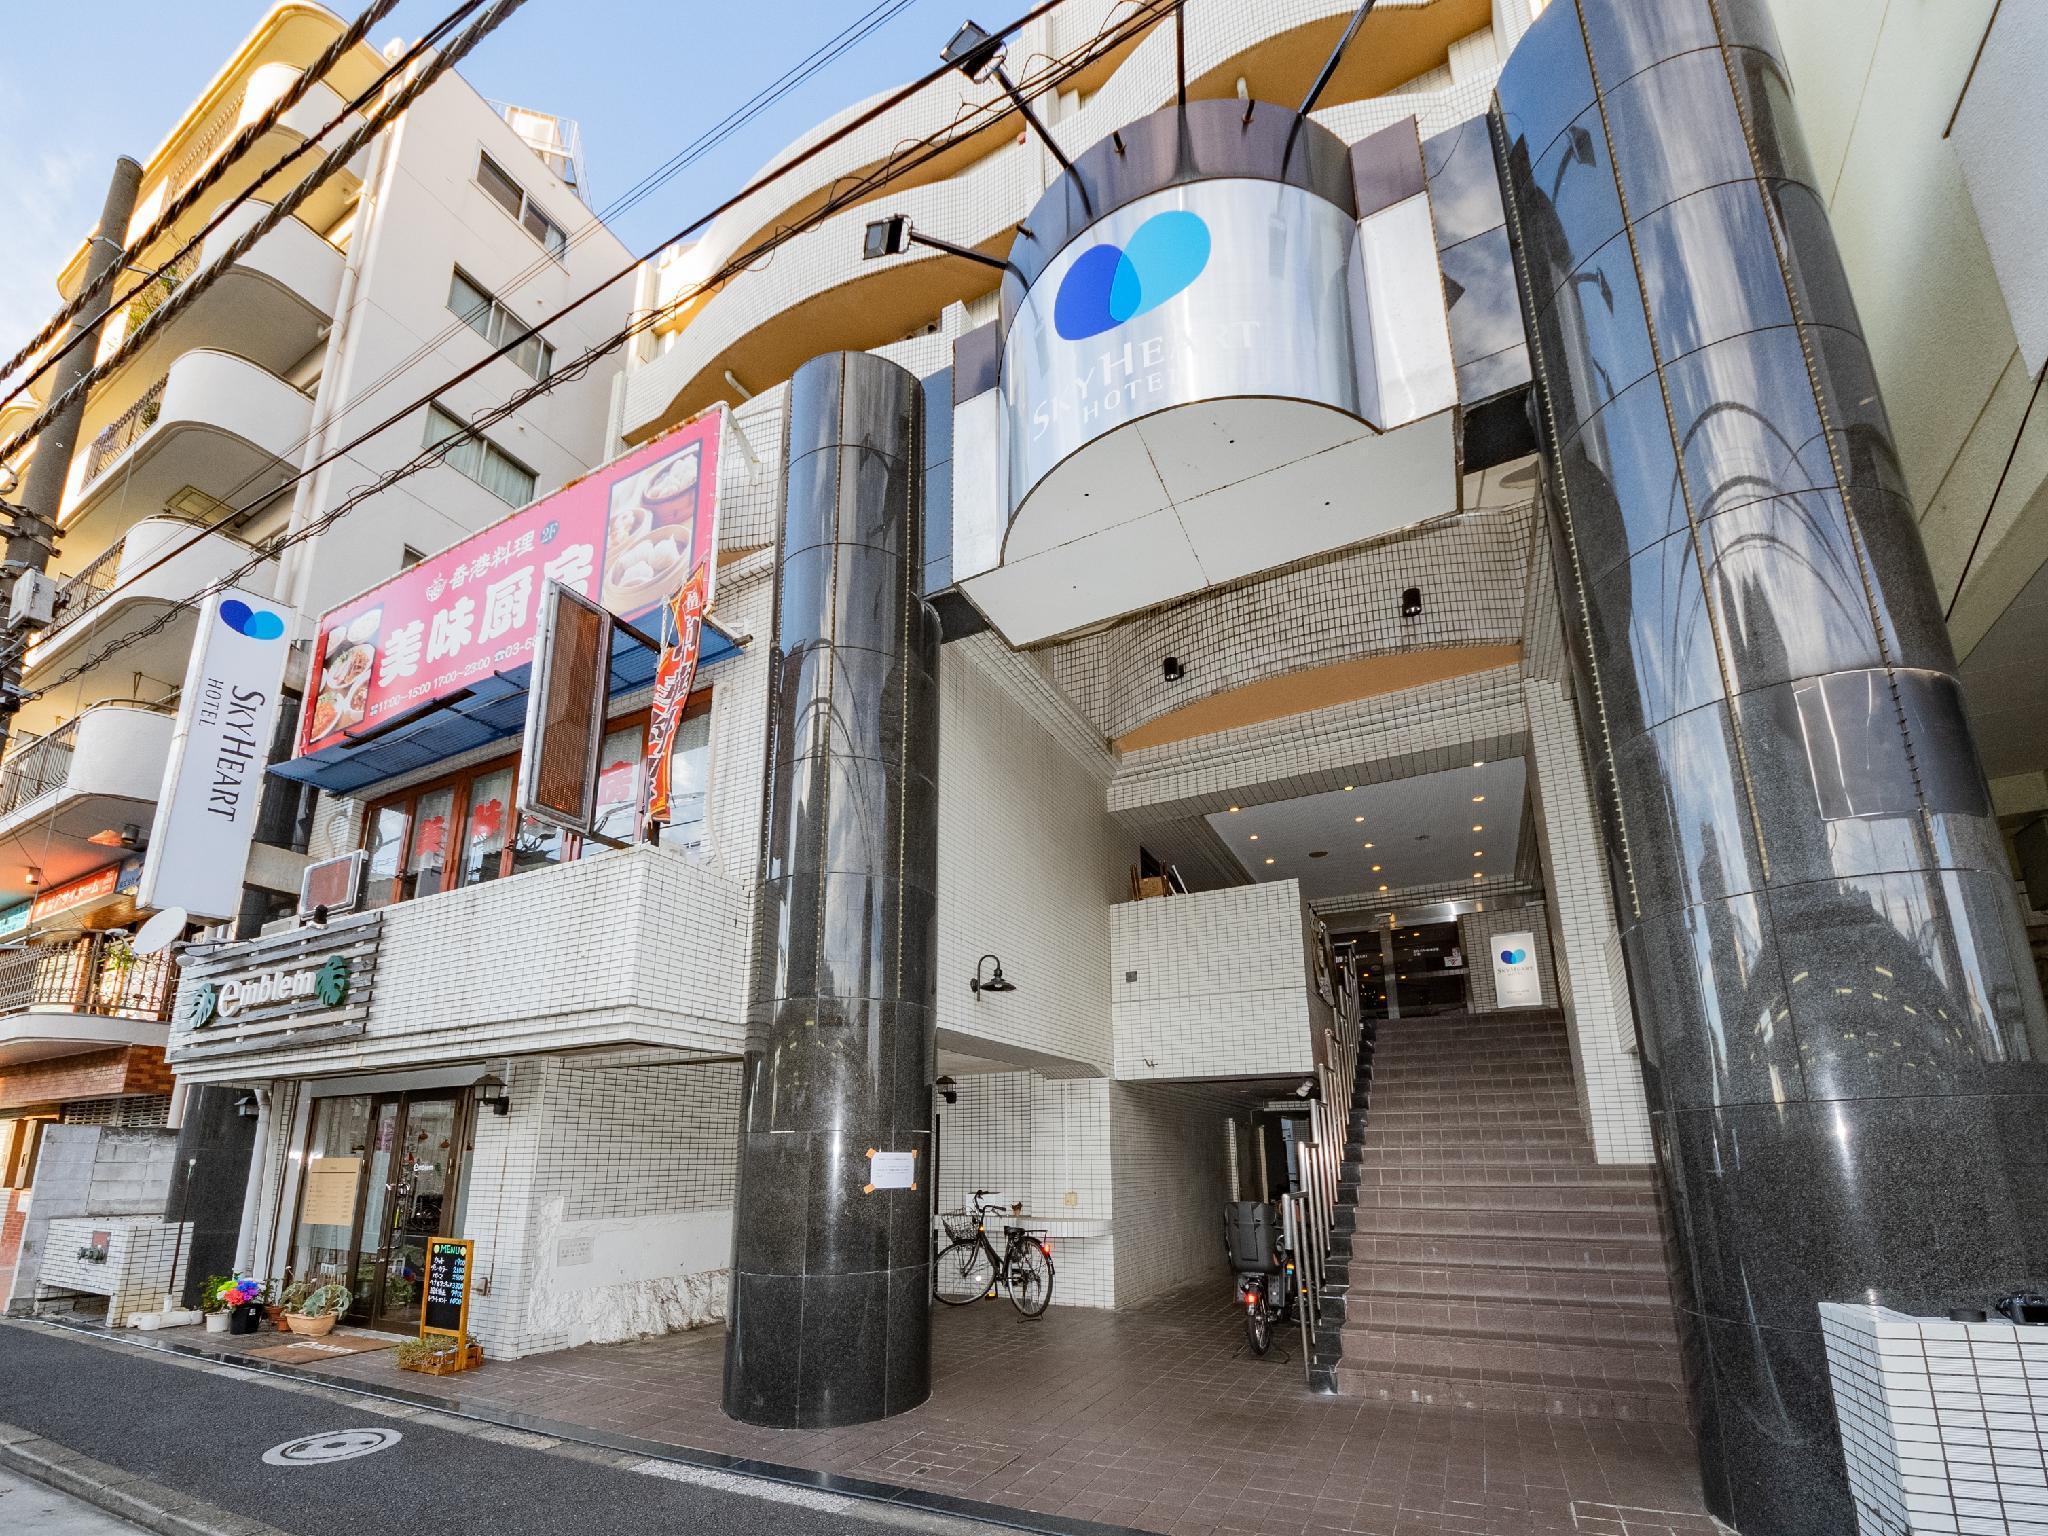 SkyHeart Hotel Koiwa